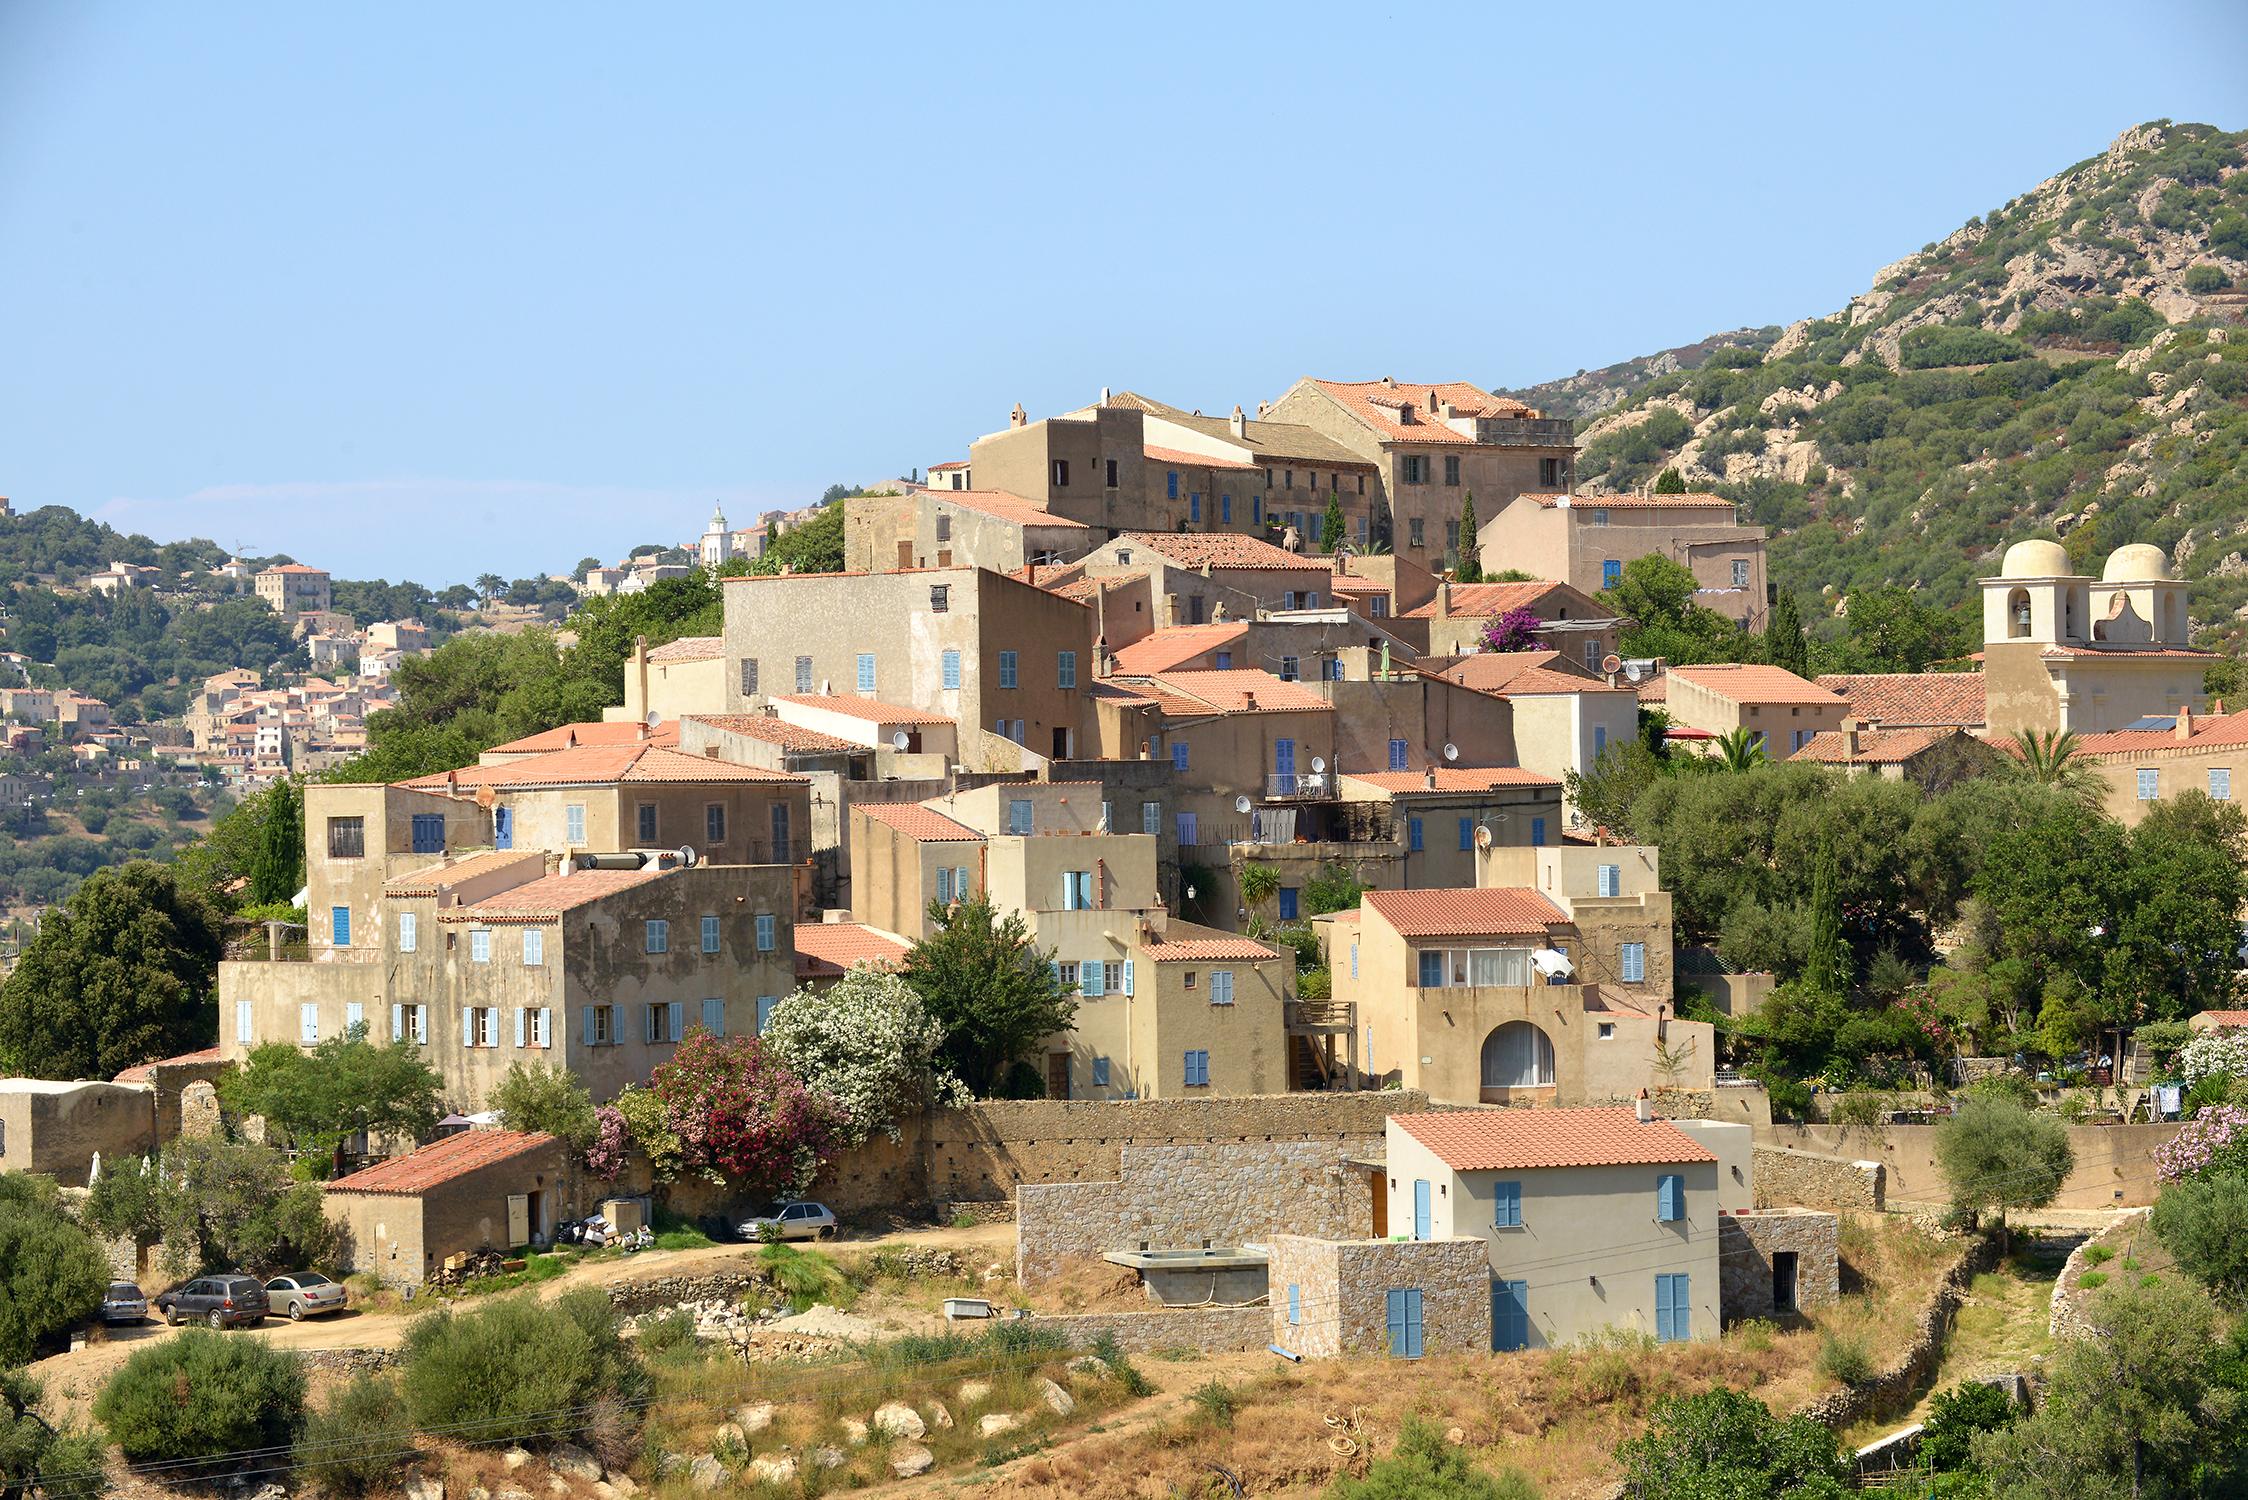 Ranska, Korsika, Pigna, vuoristokylä